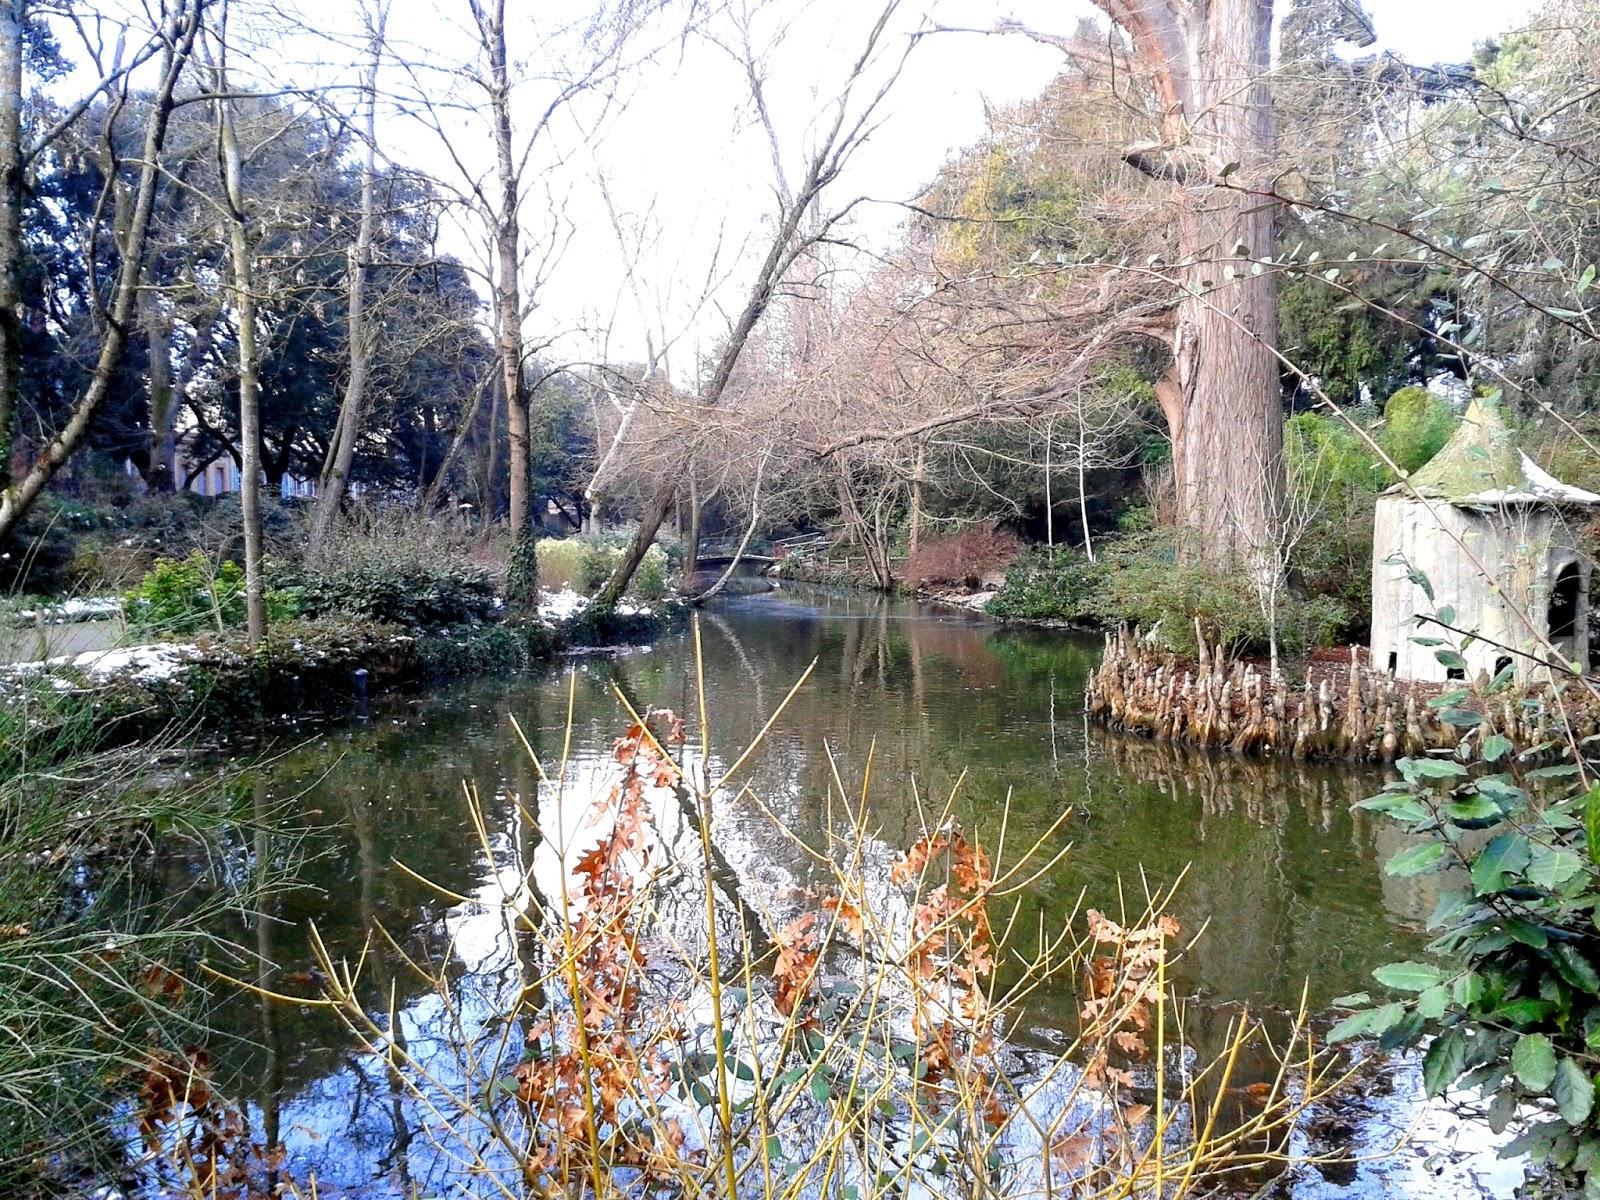 Joanmira 2 pays francophones photos toulouse jardin des plantes - Toulouse jardin des plantes ...